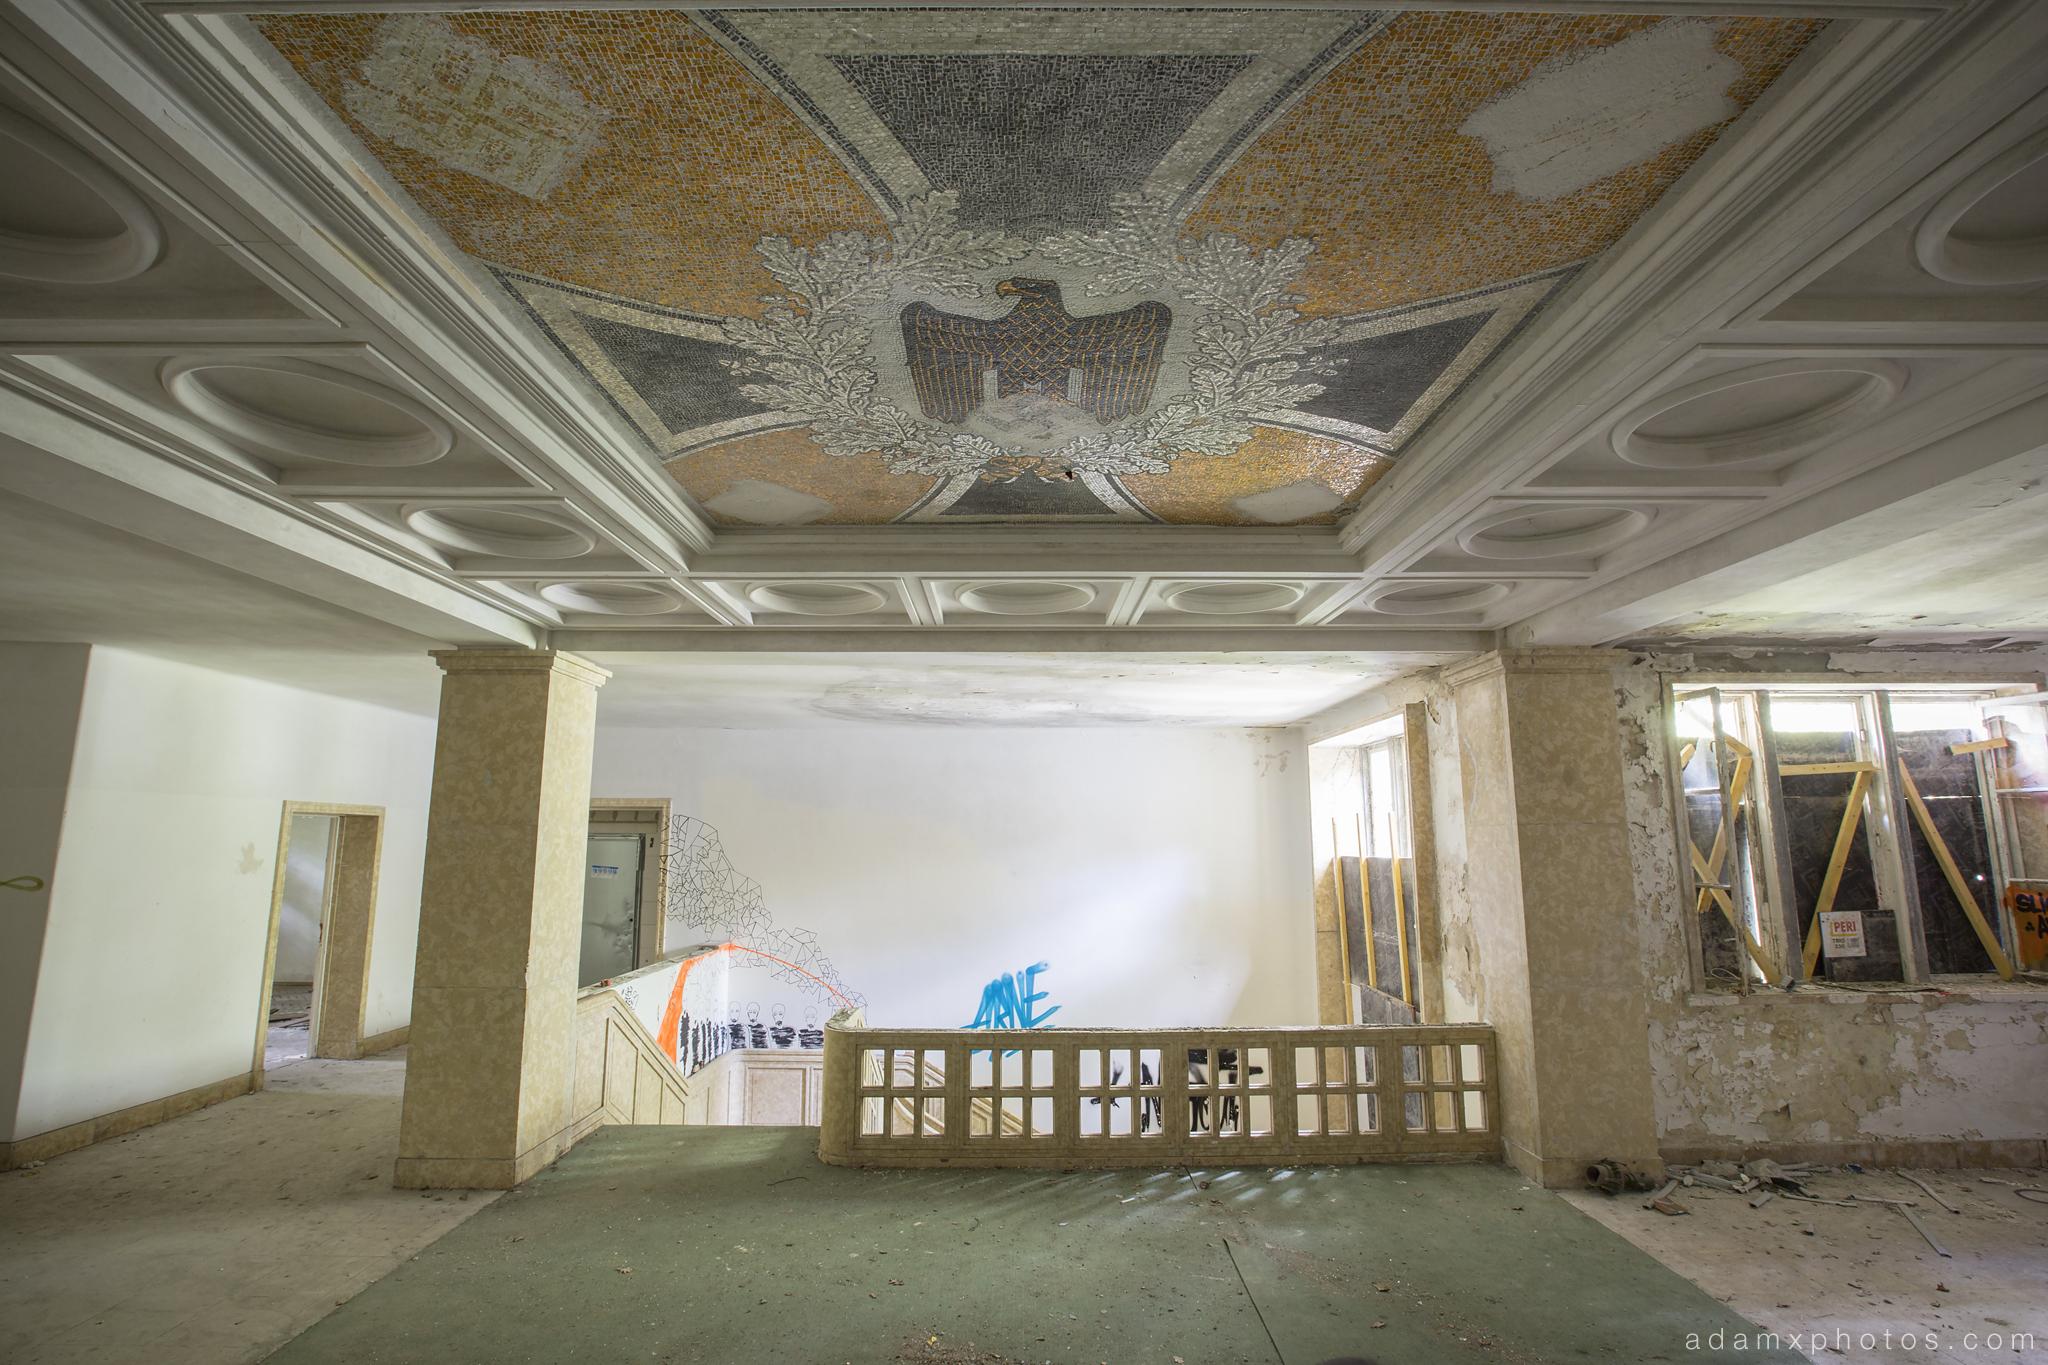 Adam X Urbex Krampnitz Kaserne Germany Urban Exploration Nazi Eagle Swastika Swastikas Ceiling Mosaic Decay Lost Abandoned Hidden tiles detail room